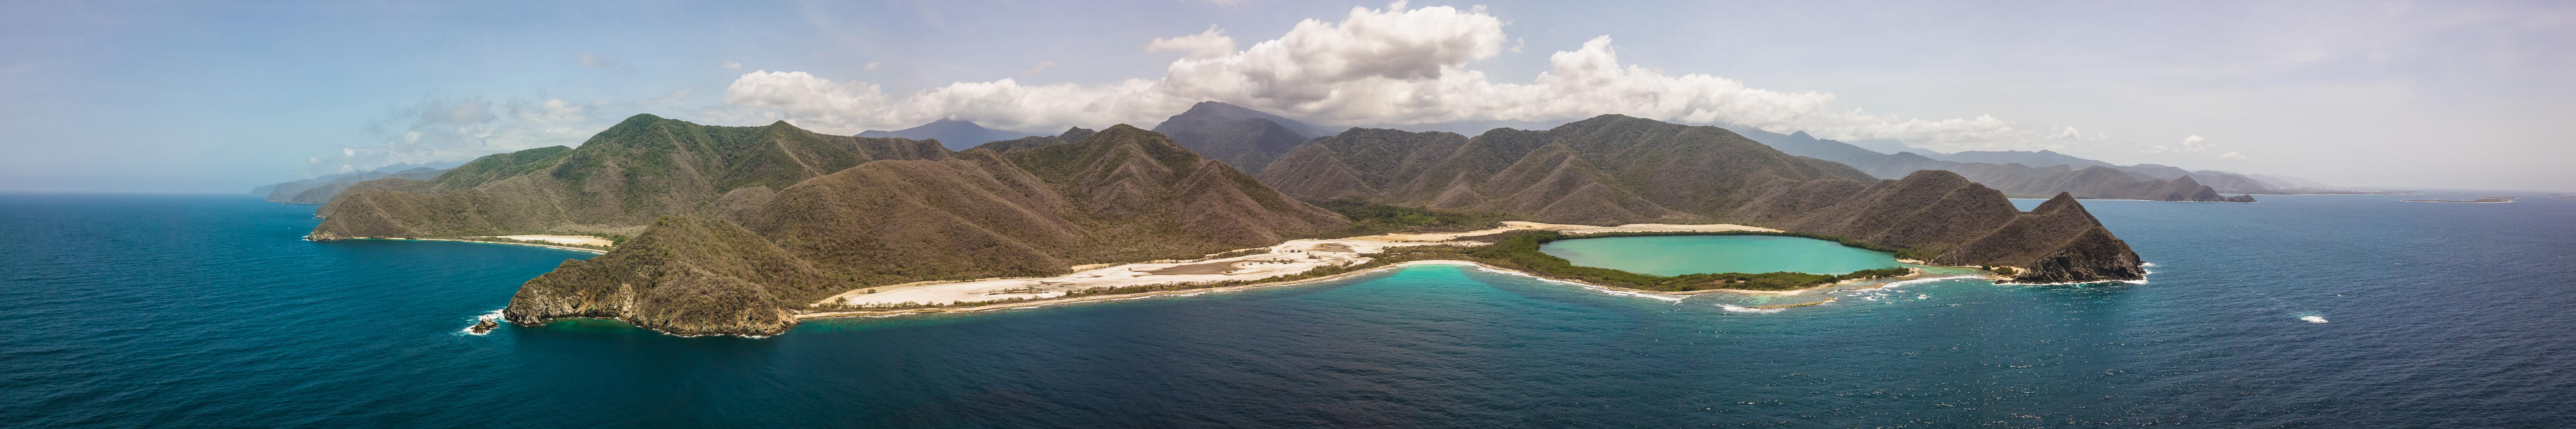 Playa de Yapascua, Carabobo